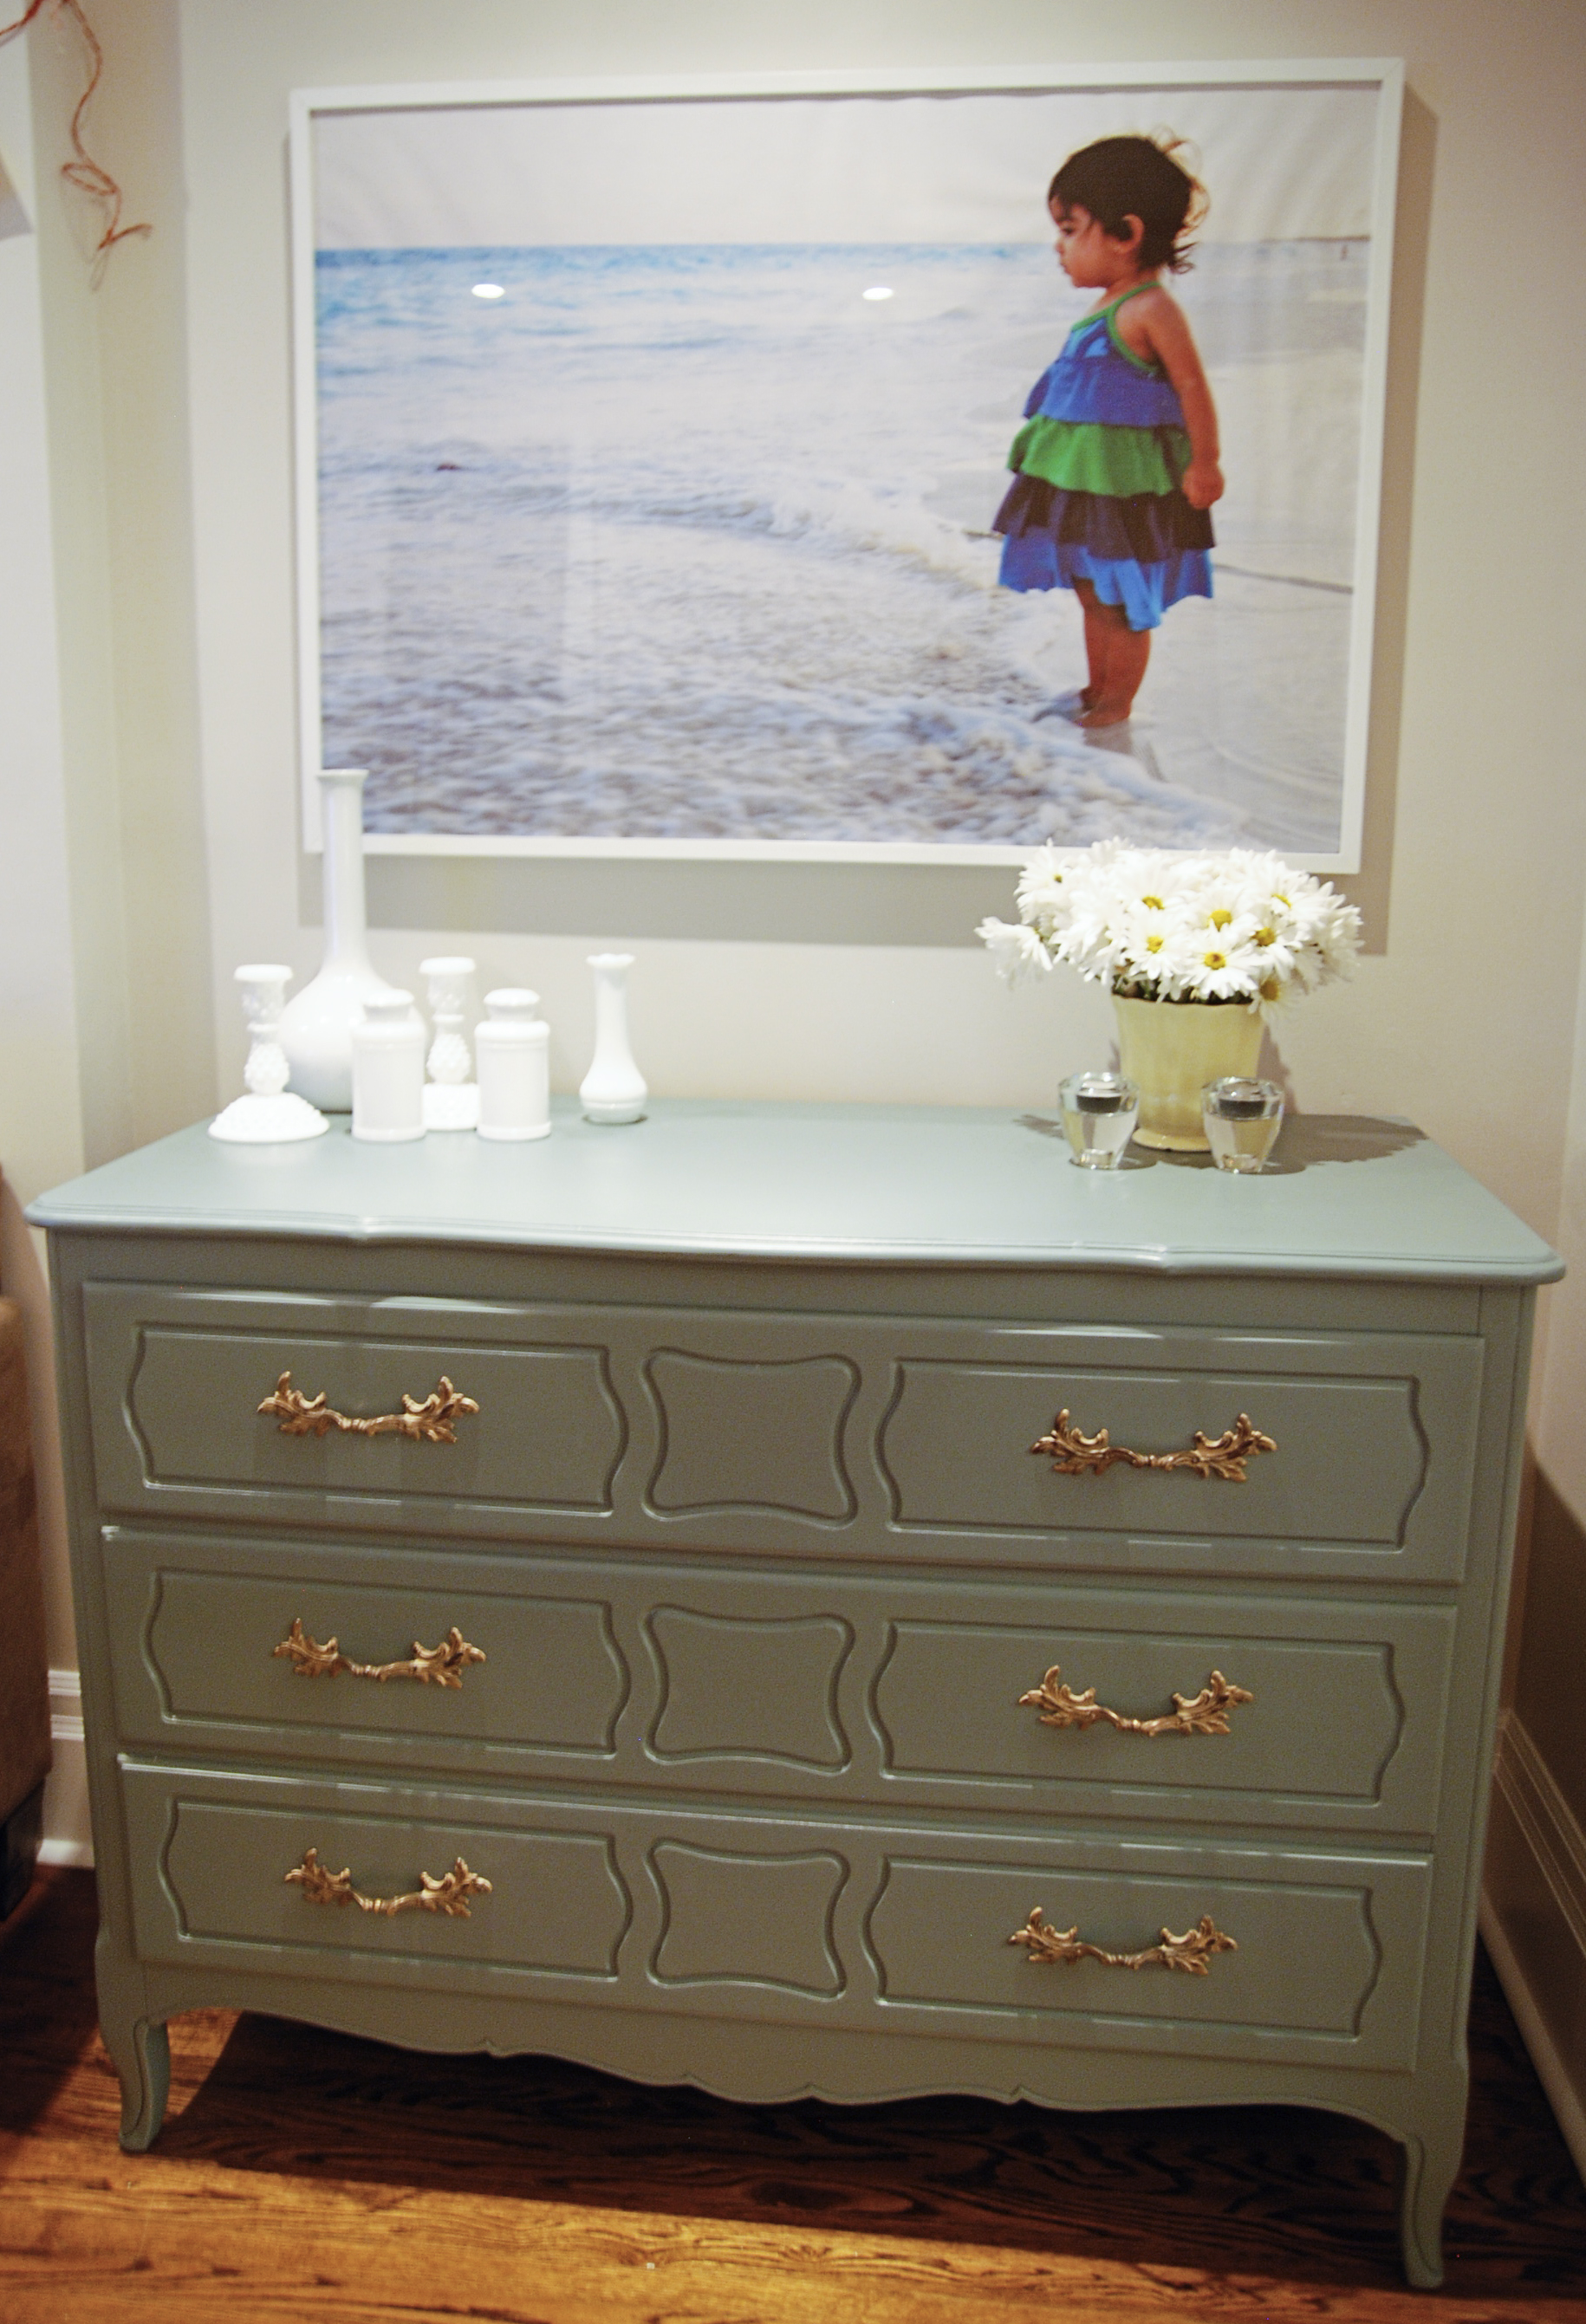 schoolhouse slate dresser, teal painted dresser, vintage painted dresser